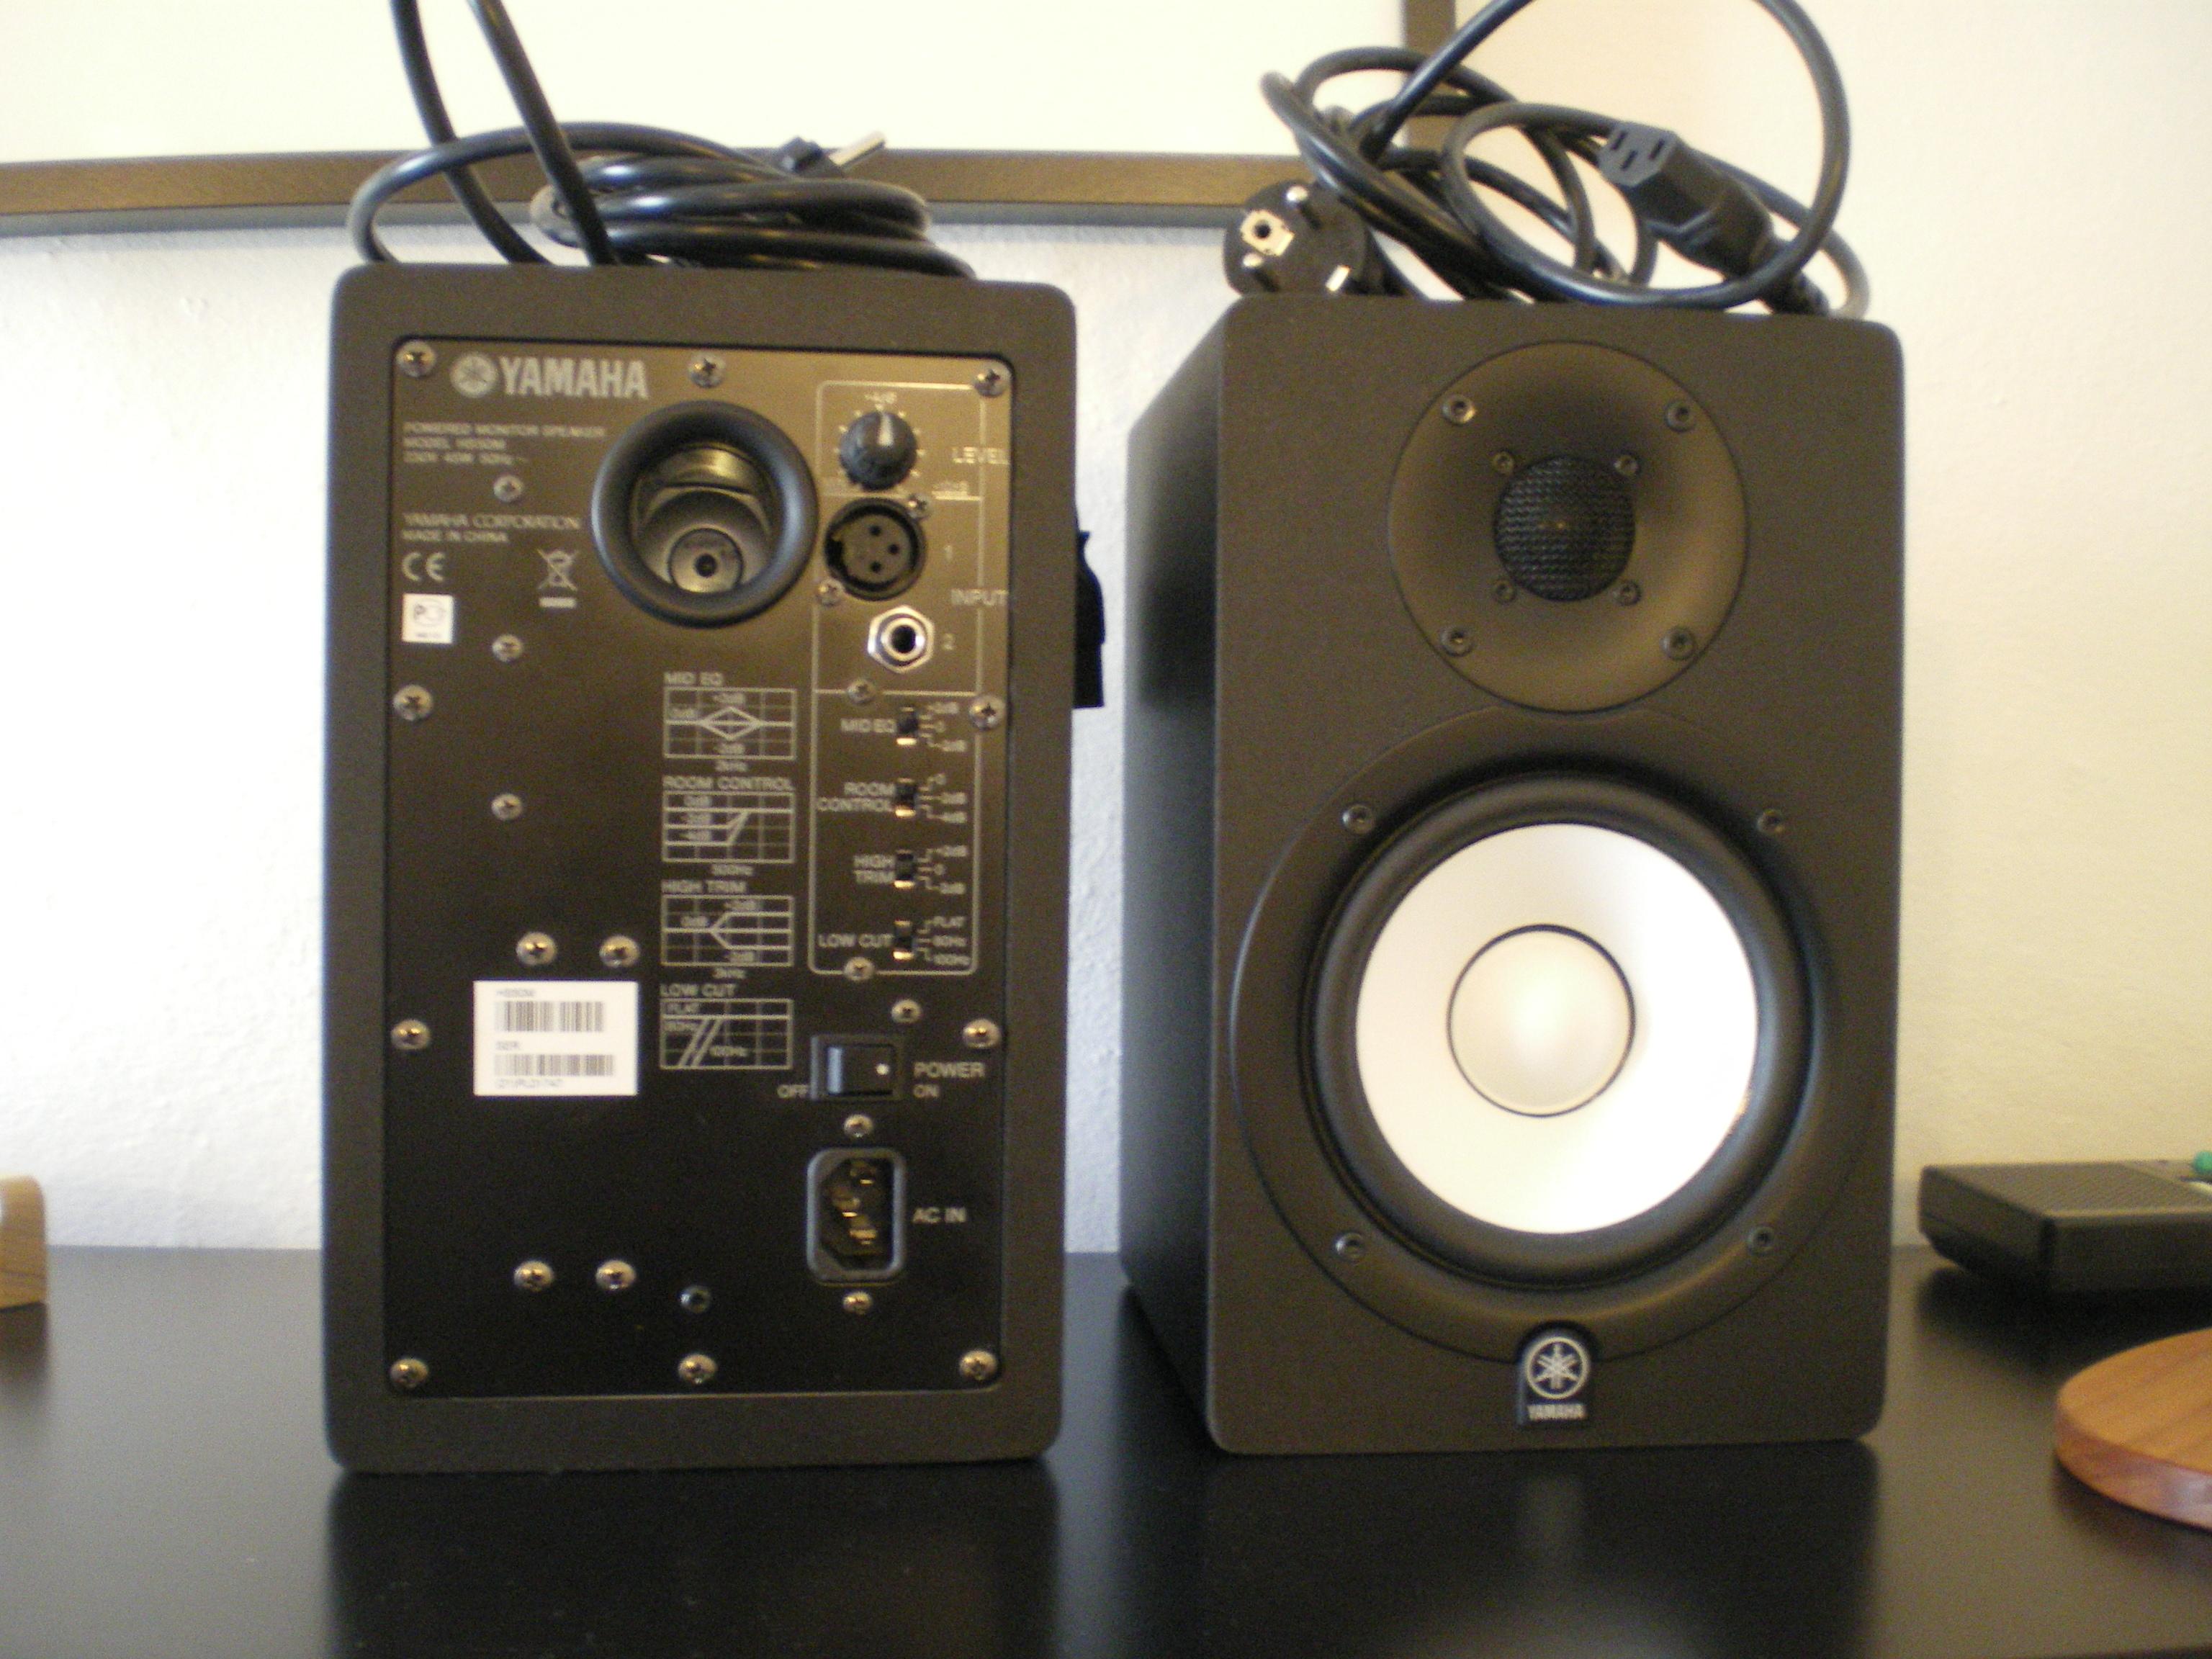 Yamaha hs50m image 300626 audiofanzine for Yamaha hs50m review